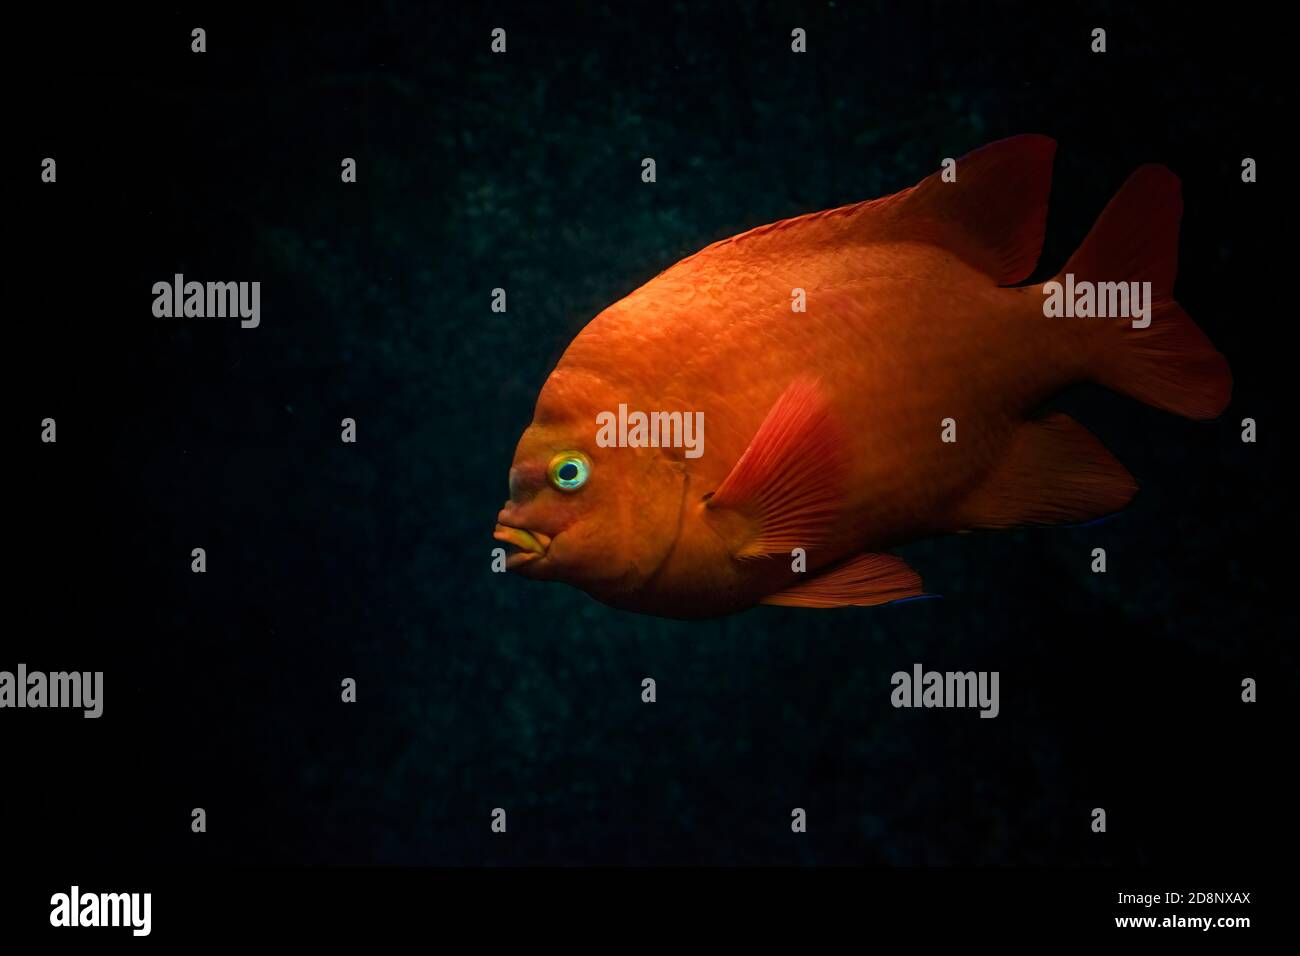 Red orange Garibaldi or Garibaldi damselfish (Hypsypops rubicundus) swimming in the ocean. dark background. Stock Photo